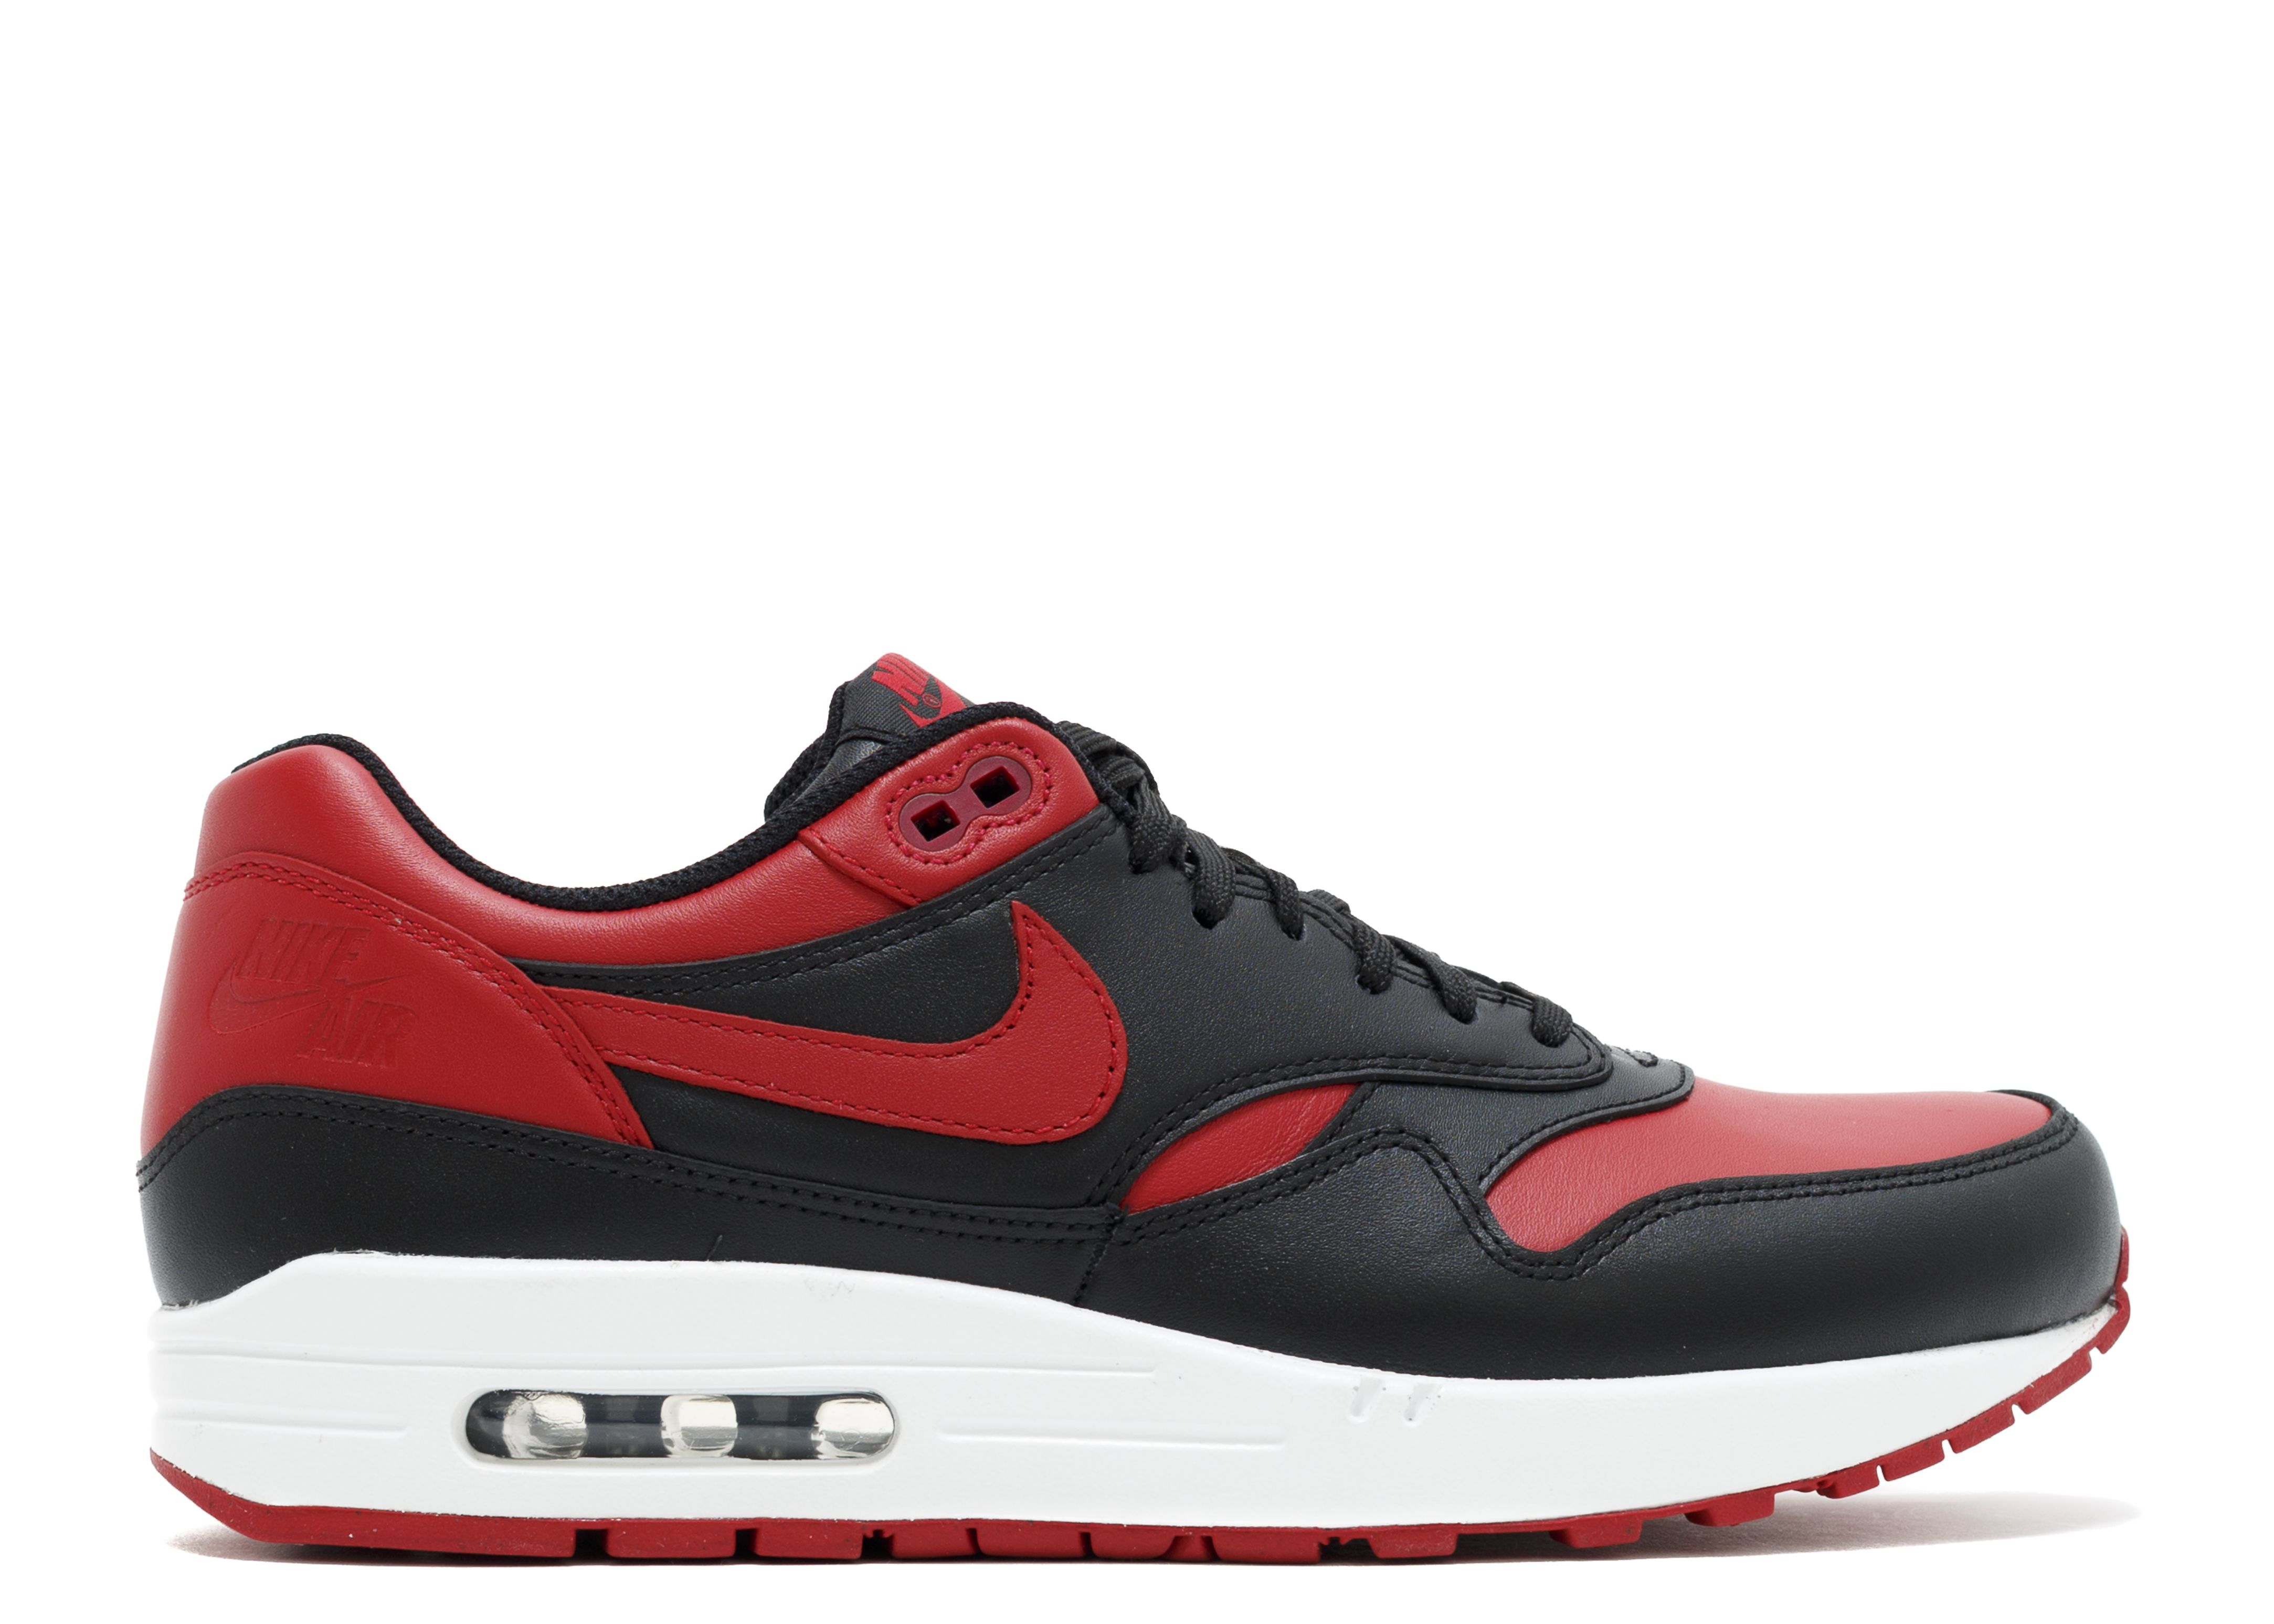 online retailer new high quality reasonably priced Nike Air Max 1 ID Pendleton British Tan | Cheap nike air max, Nike ...